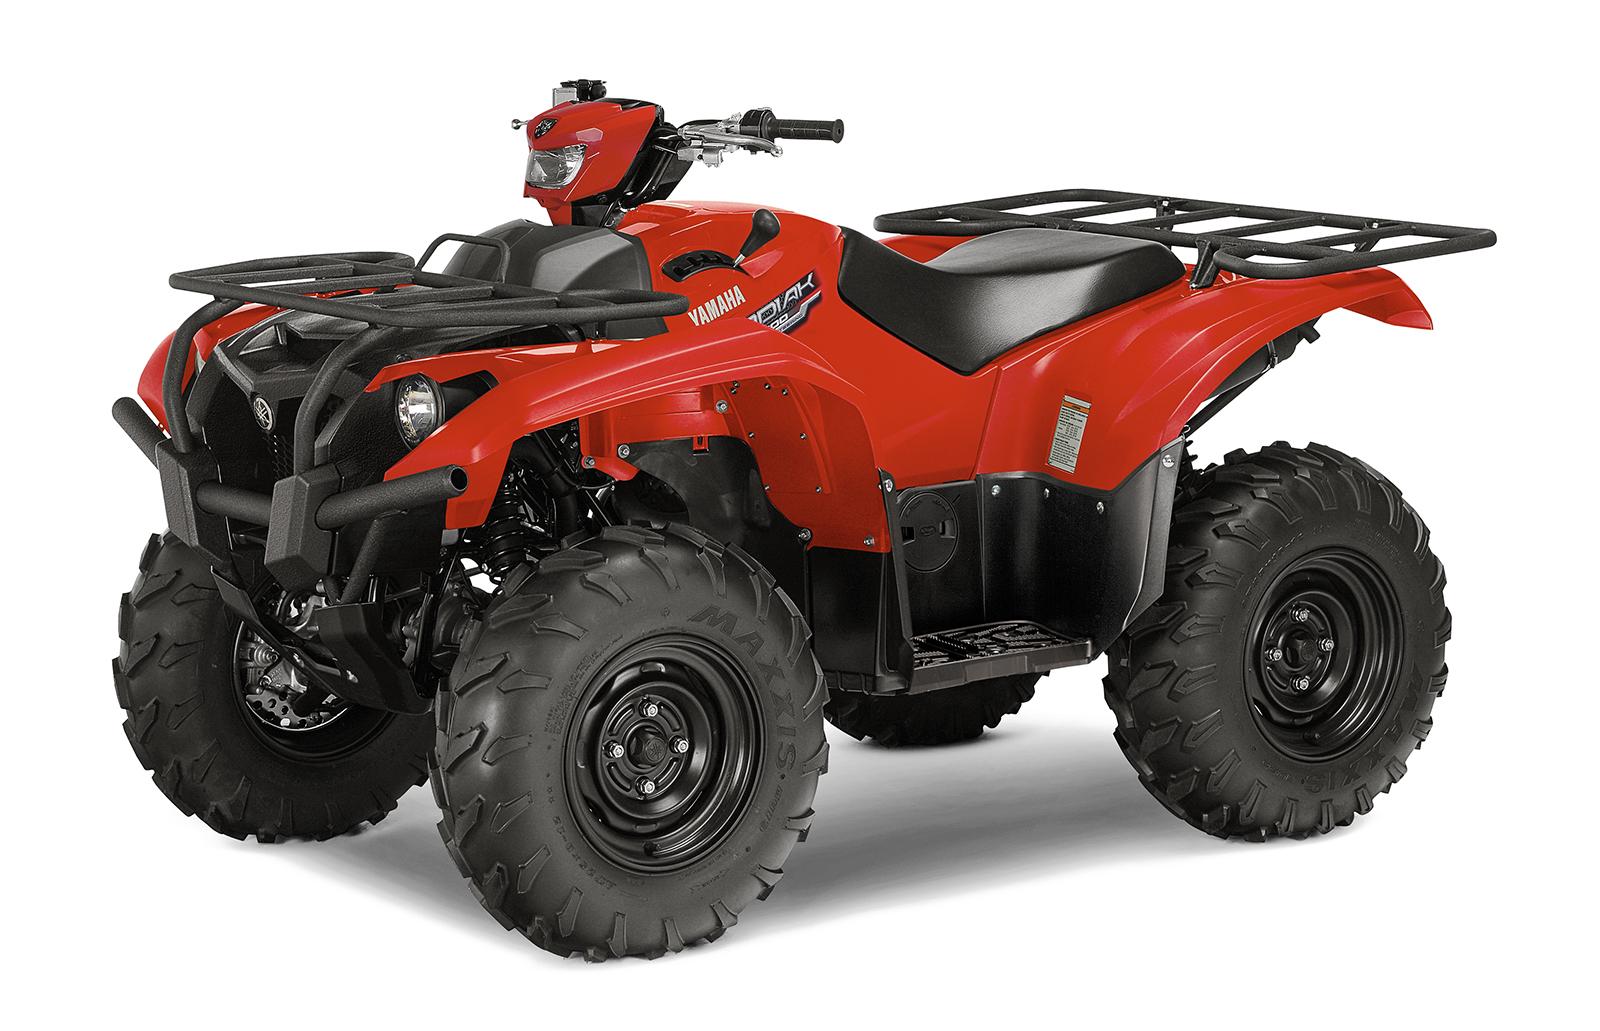 Yamaha Announces Hard Working 2016 Kodiak 700 4x4 Utility ATV